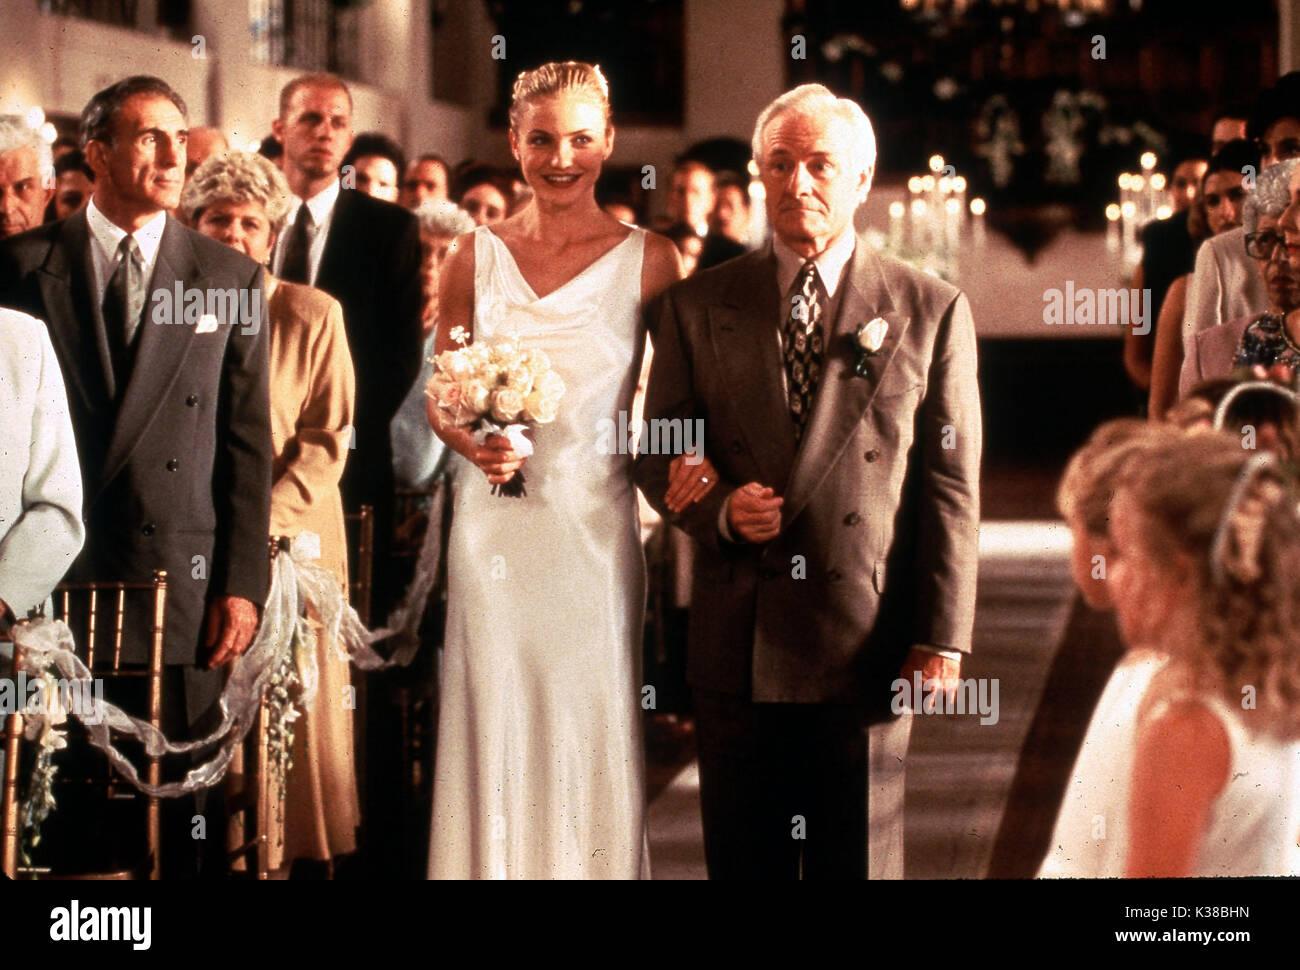 Very Bad Things Cameron Diaz Wedding Aisle Date 1998 Stock Photo